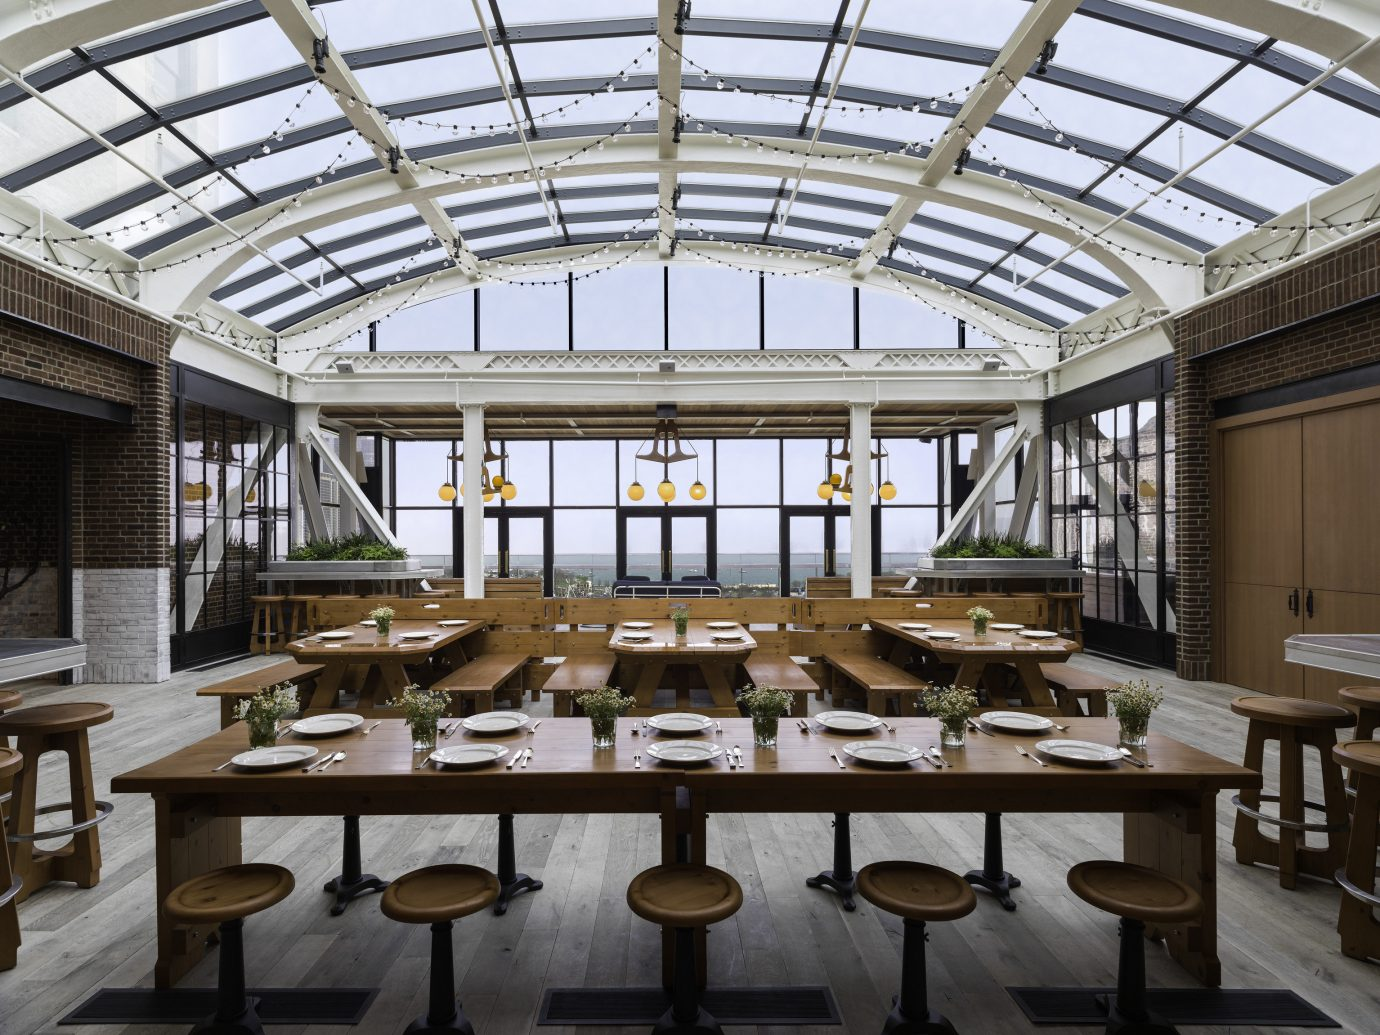 Trip Ideas indoor table floor building ceiling Architecture interior design estate restaurant Design function hall convention center meal furniture several